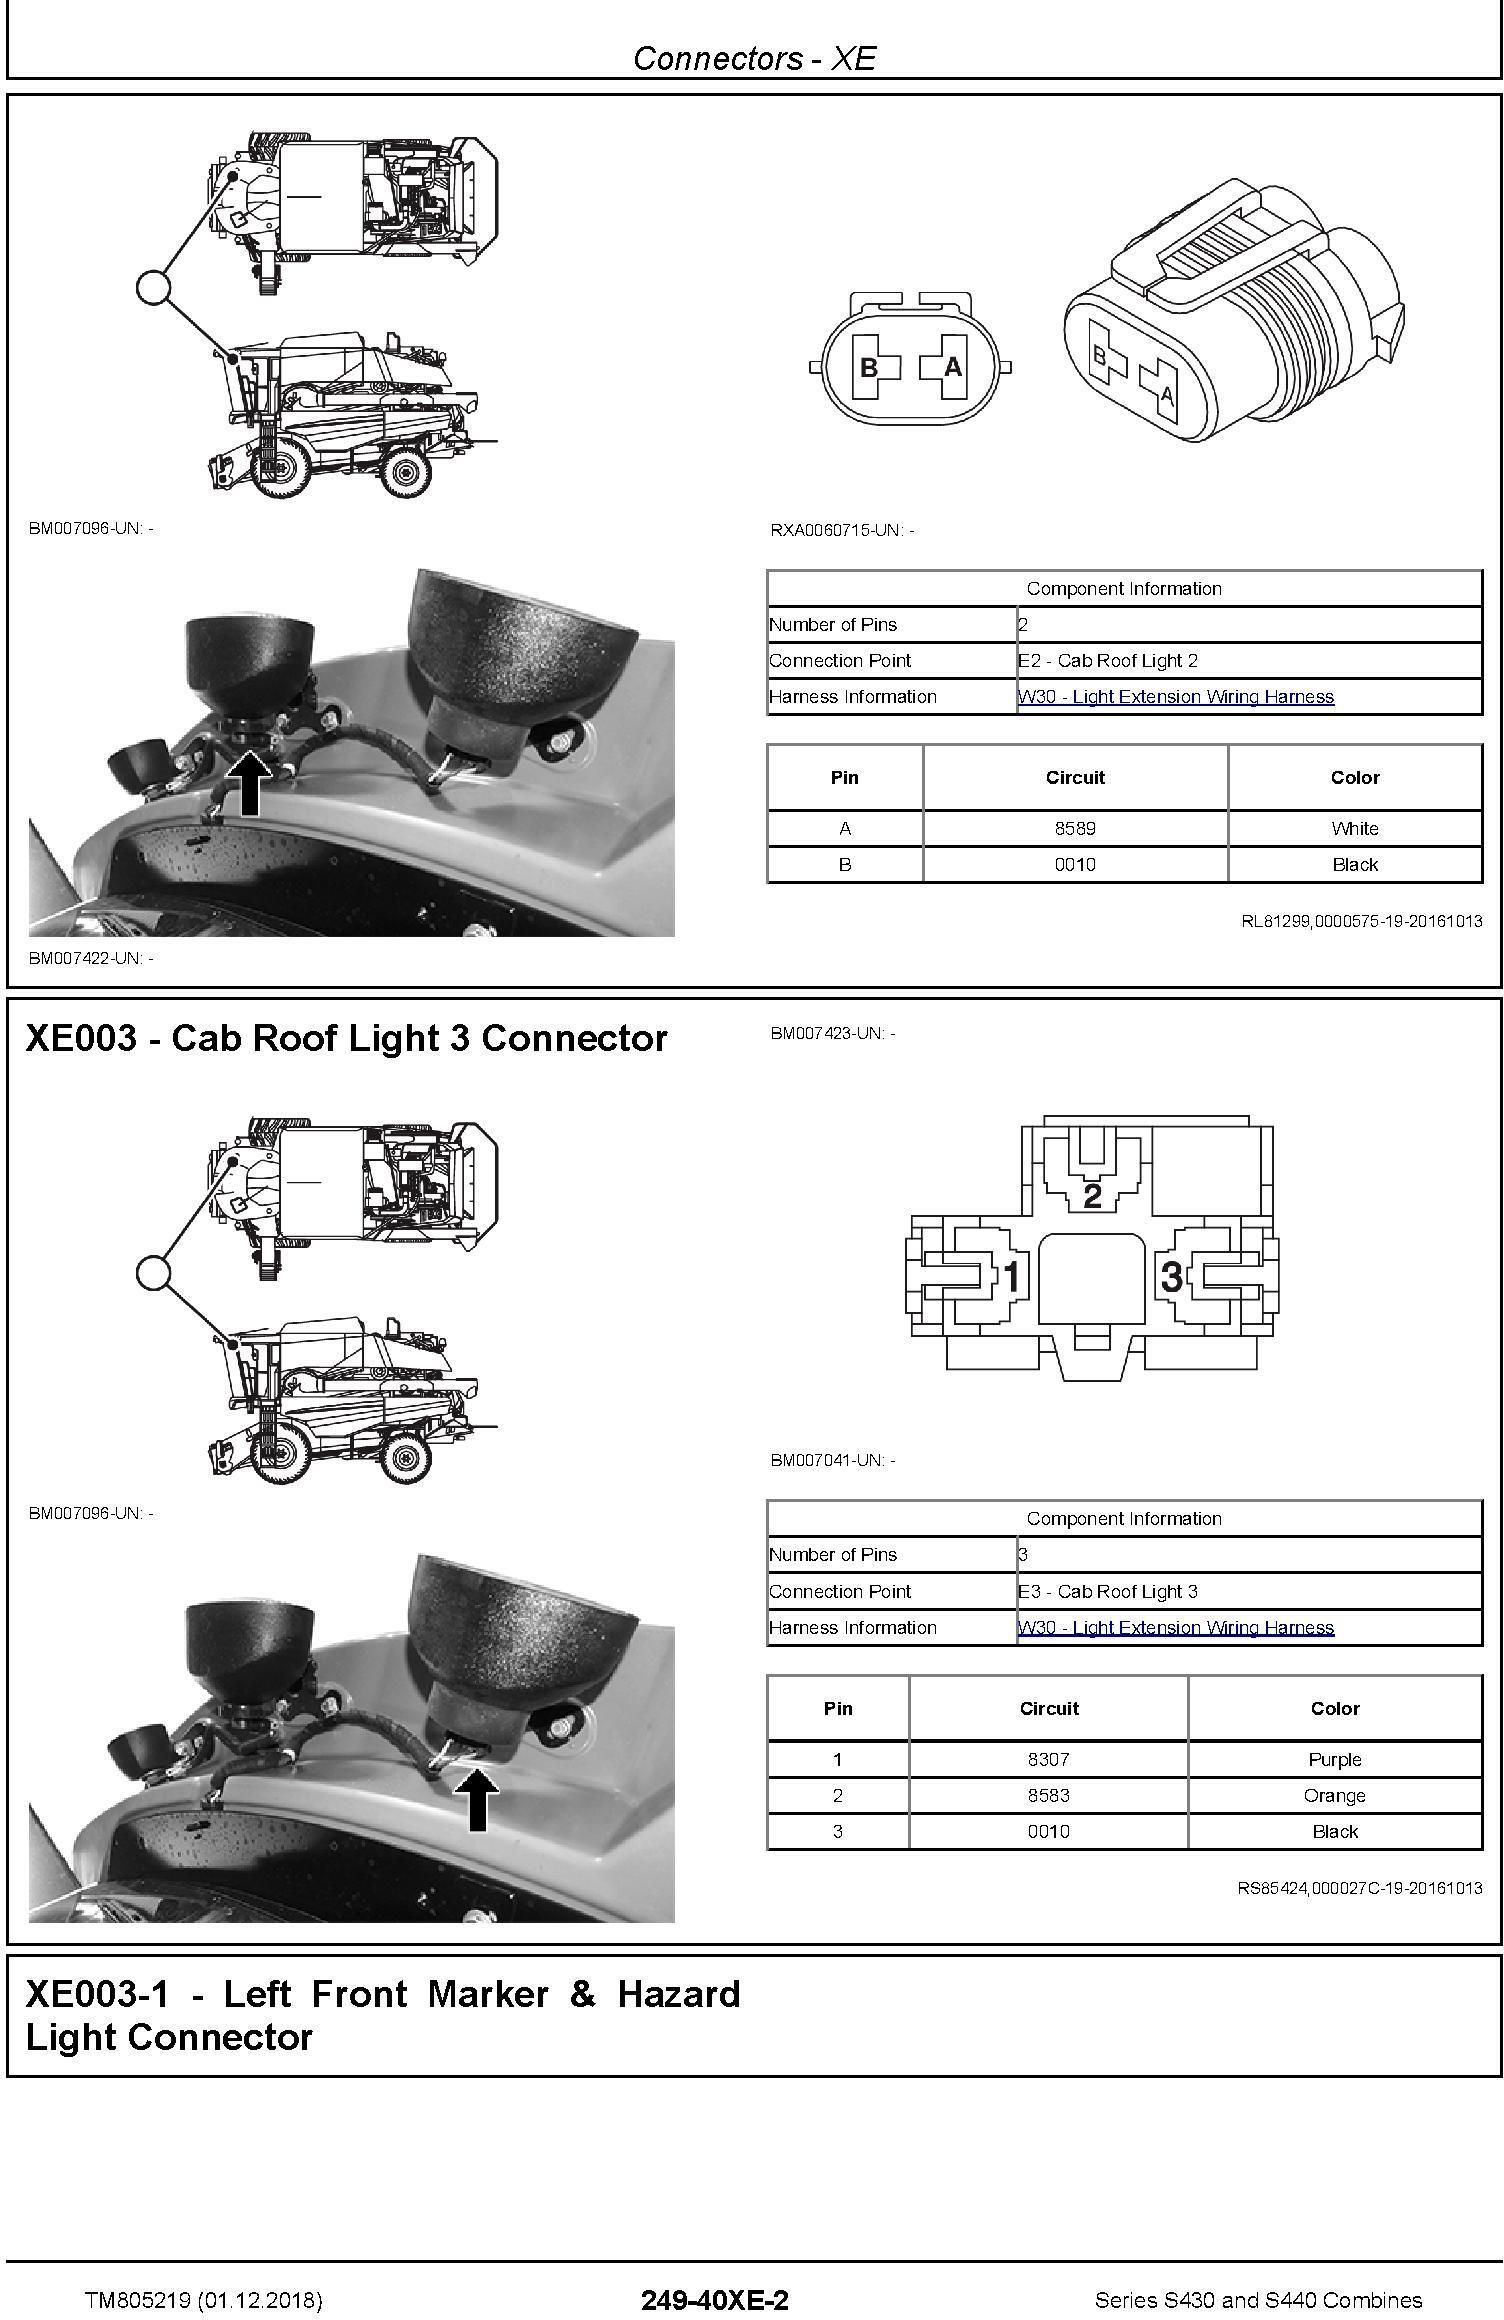 John Deere S430 and S440 Combines Diagnostic Technical Service Manual (TM805219) - 1